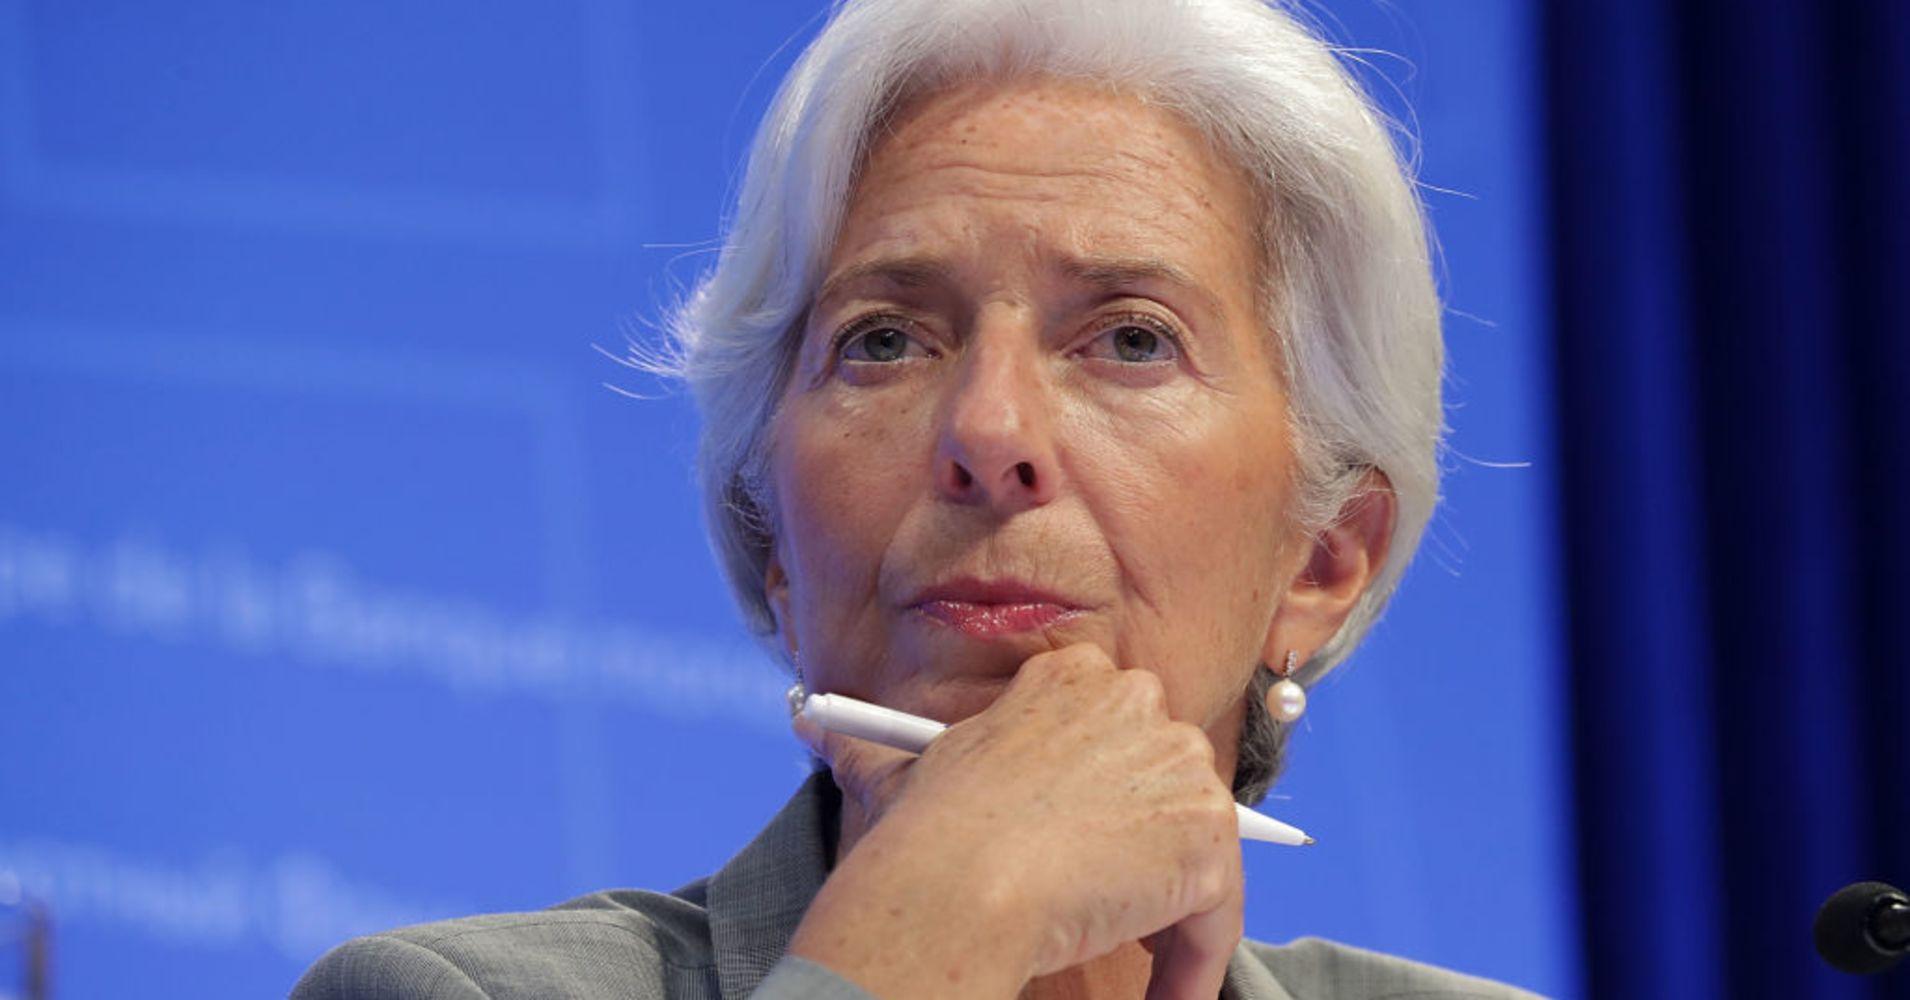 Глава МВФ Кристин Лагард посетит Казахстан с визитом